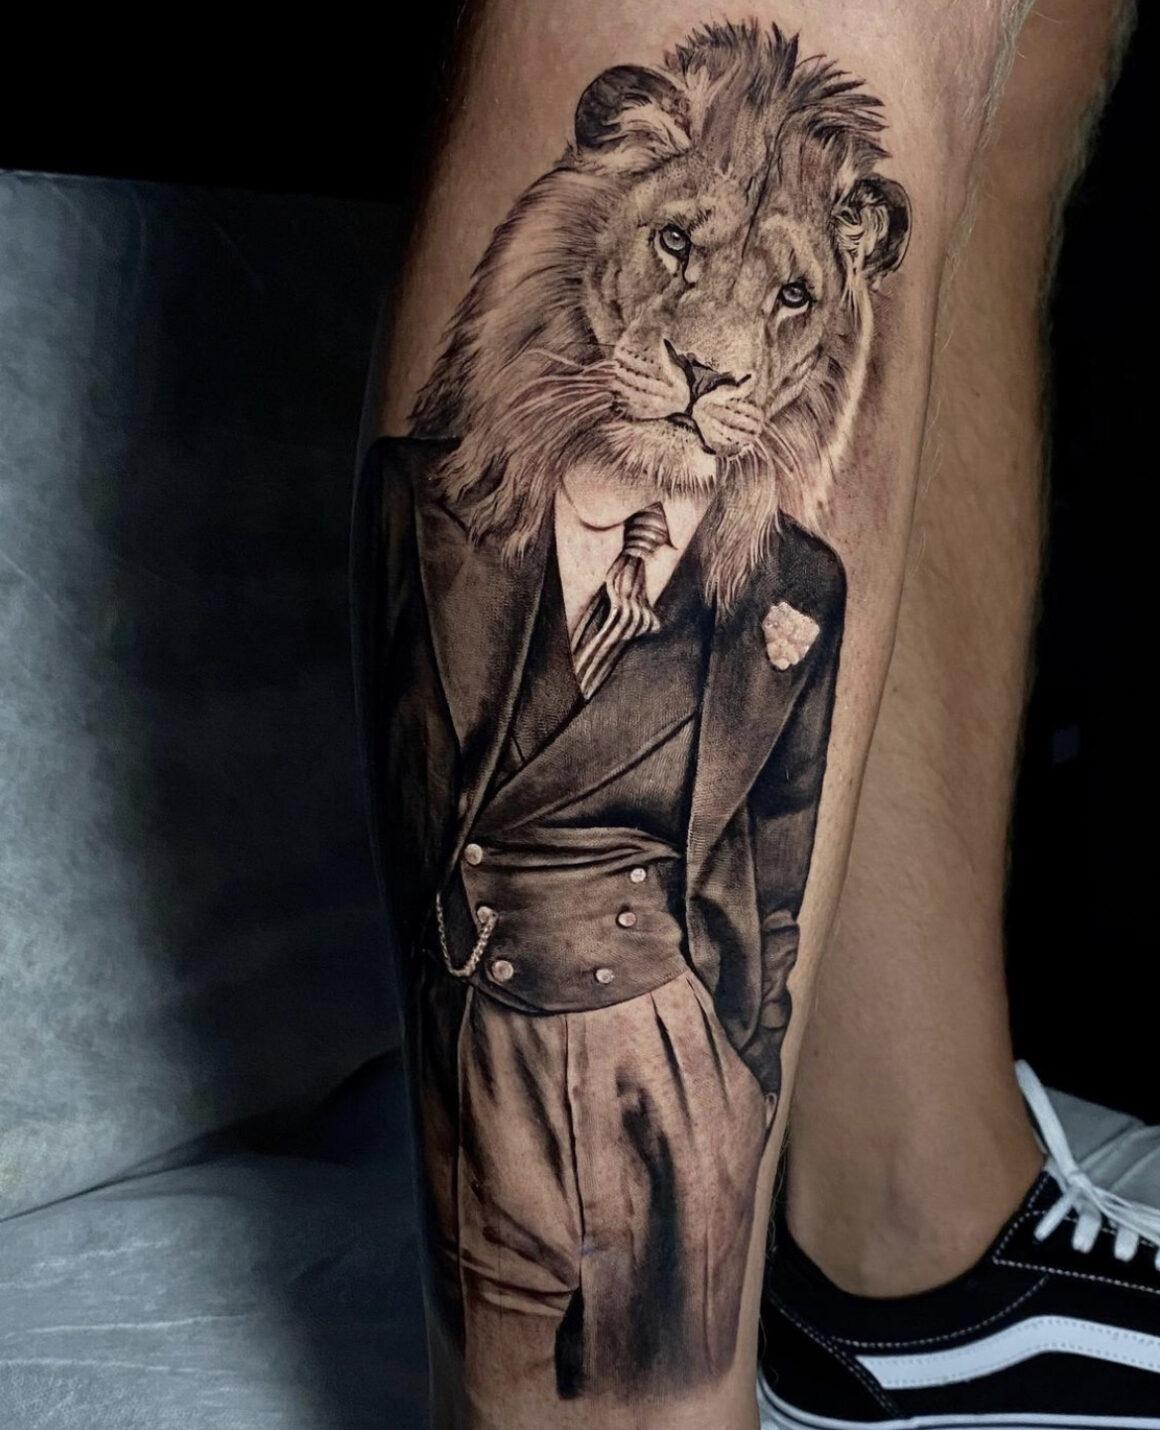 Matteo Pasqualin, Artigiano Tatuatore, Brembate, Italy